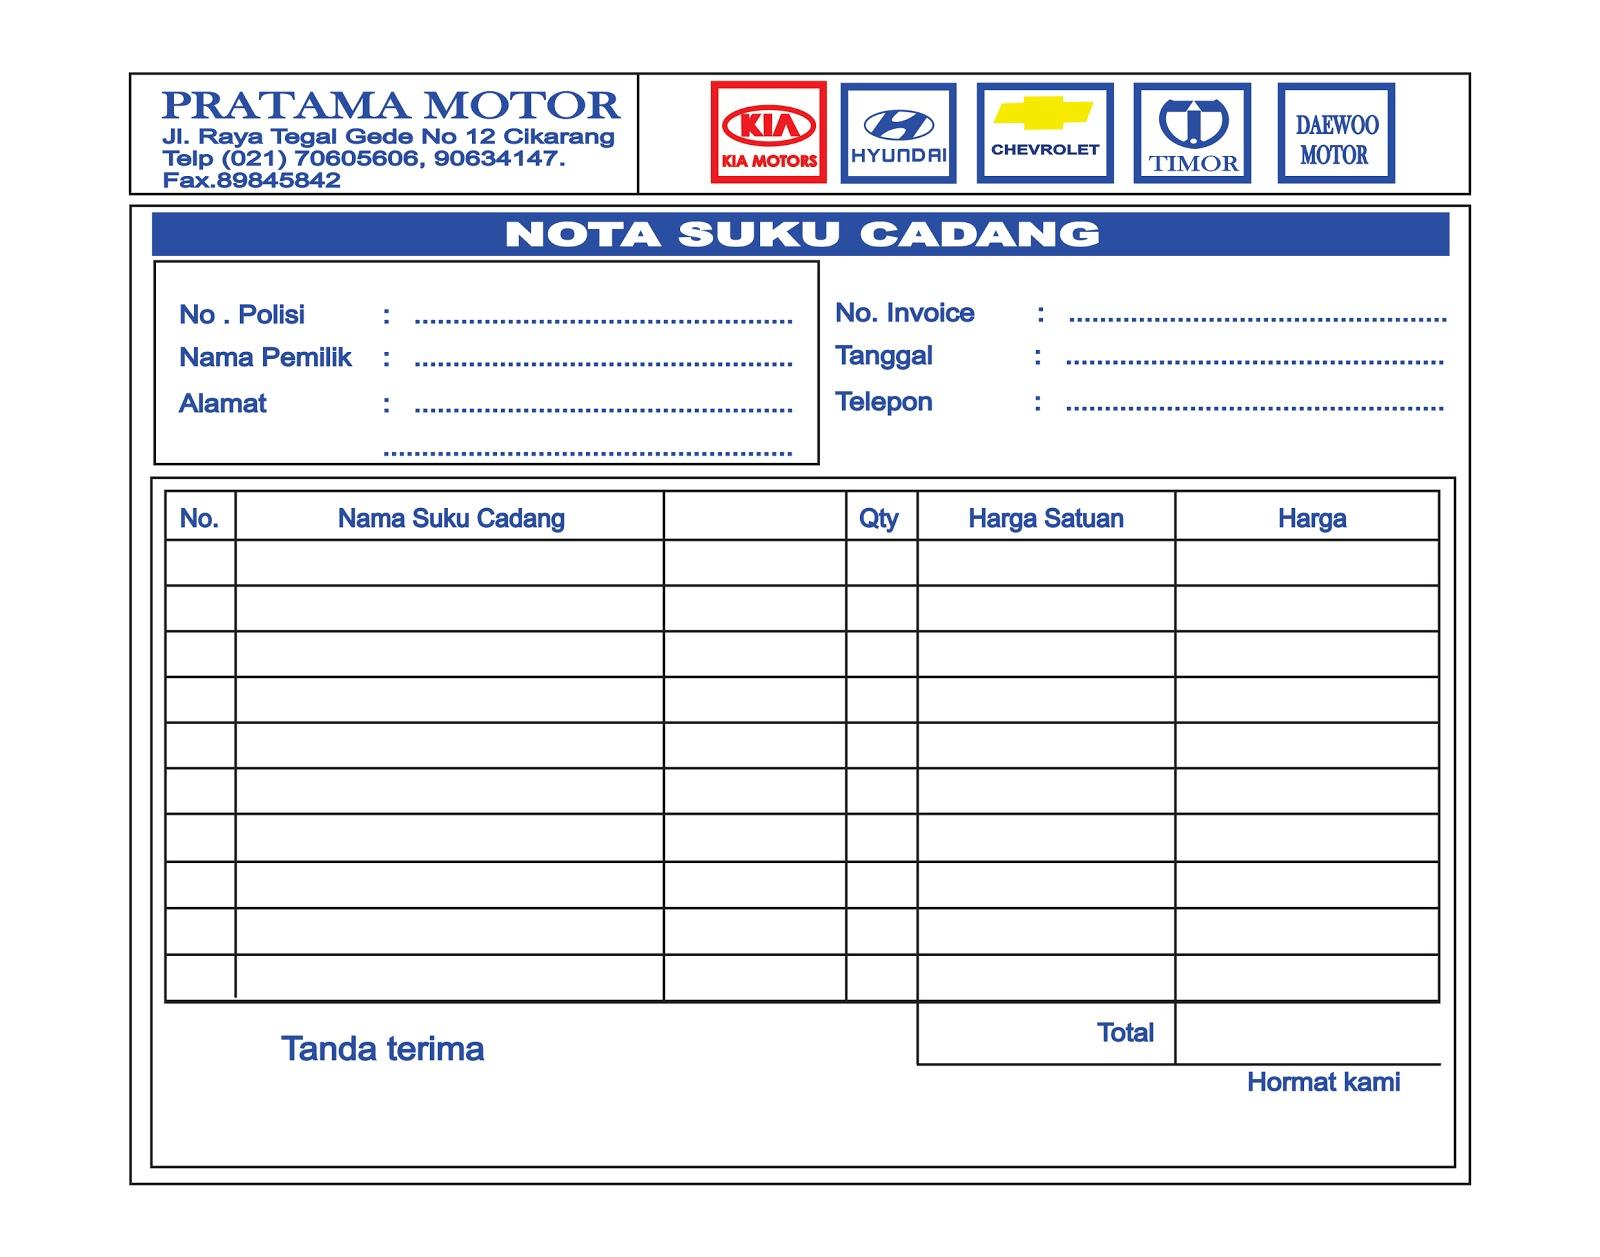 Contoh Nota Bon Rumah Makan Padang Modify 5